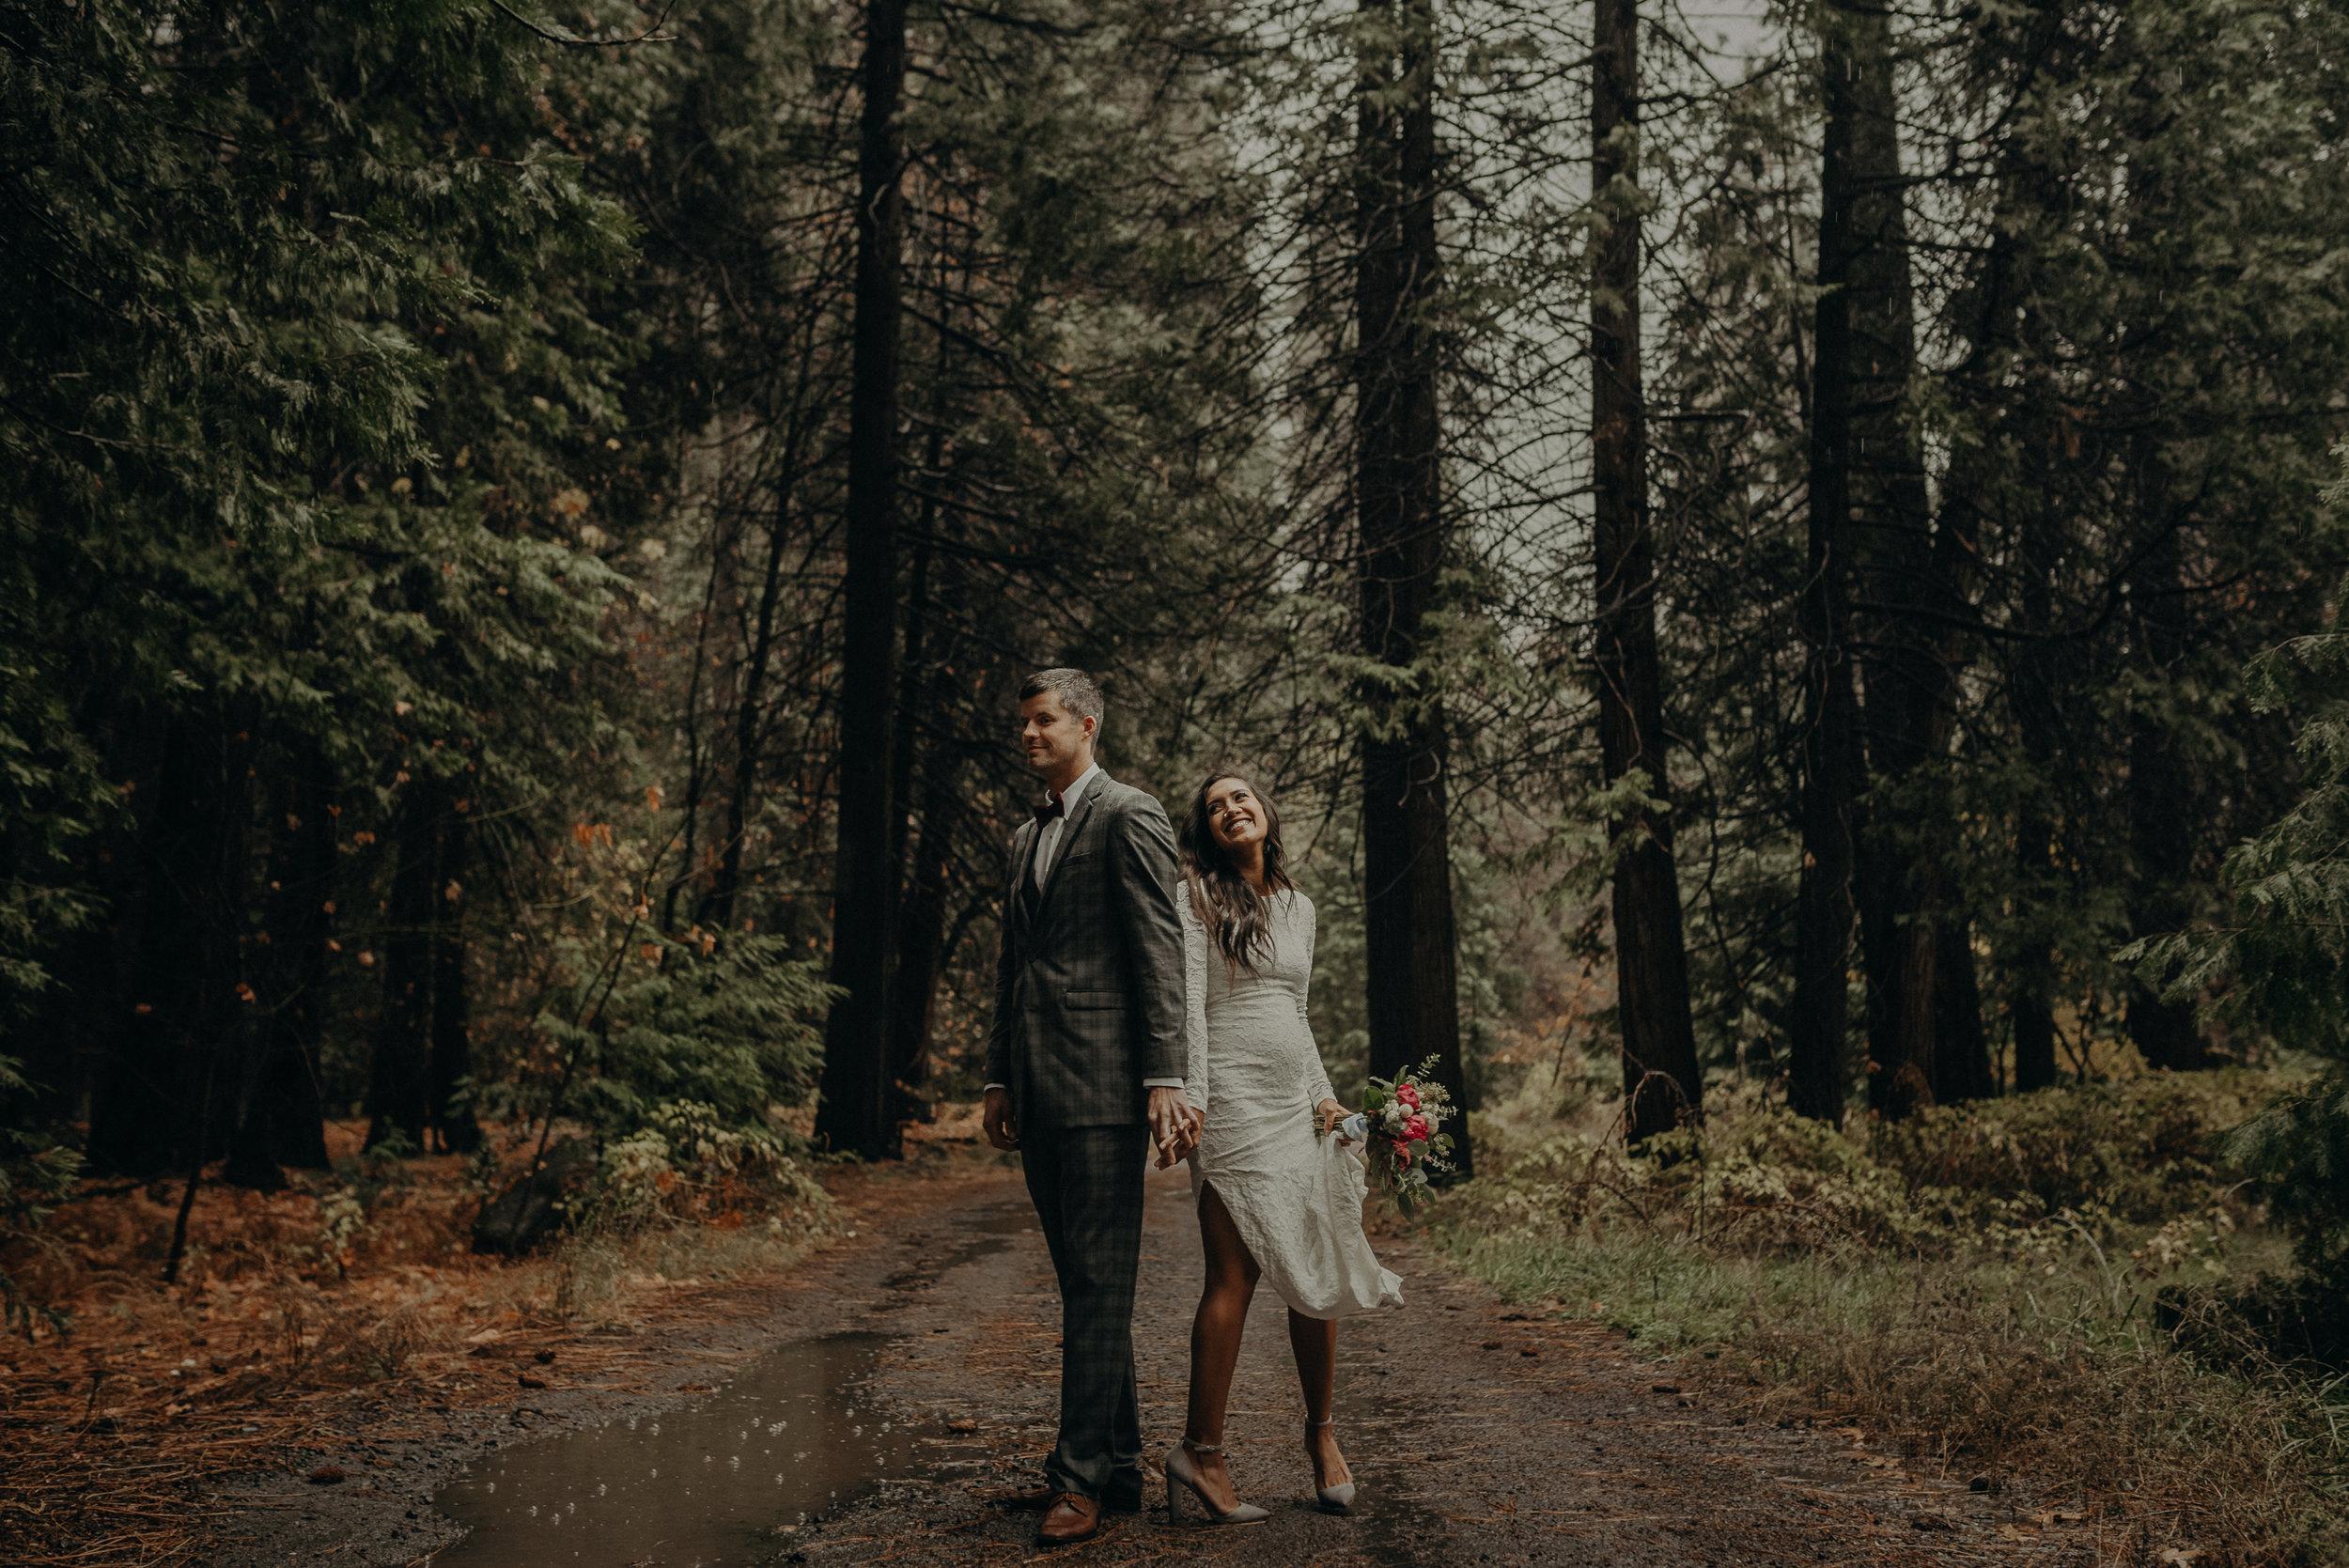 Isaiah + Taylor Photography - Yosemite Elopement - Los Angeles Wedding Photographer-12.jpg